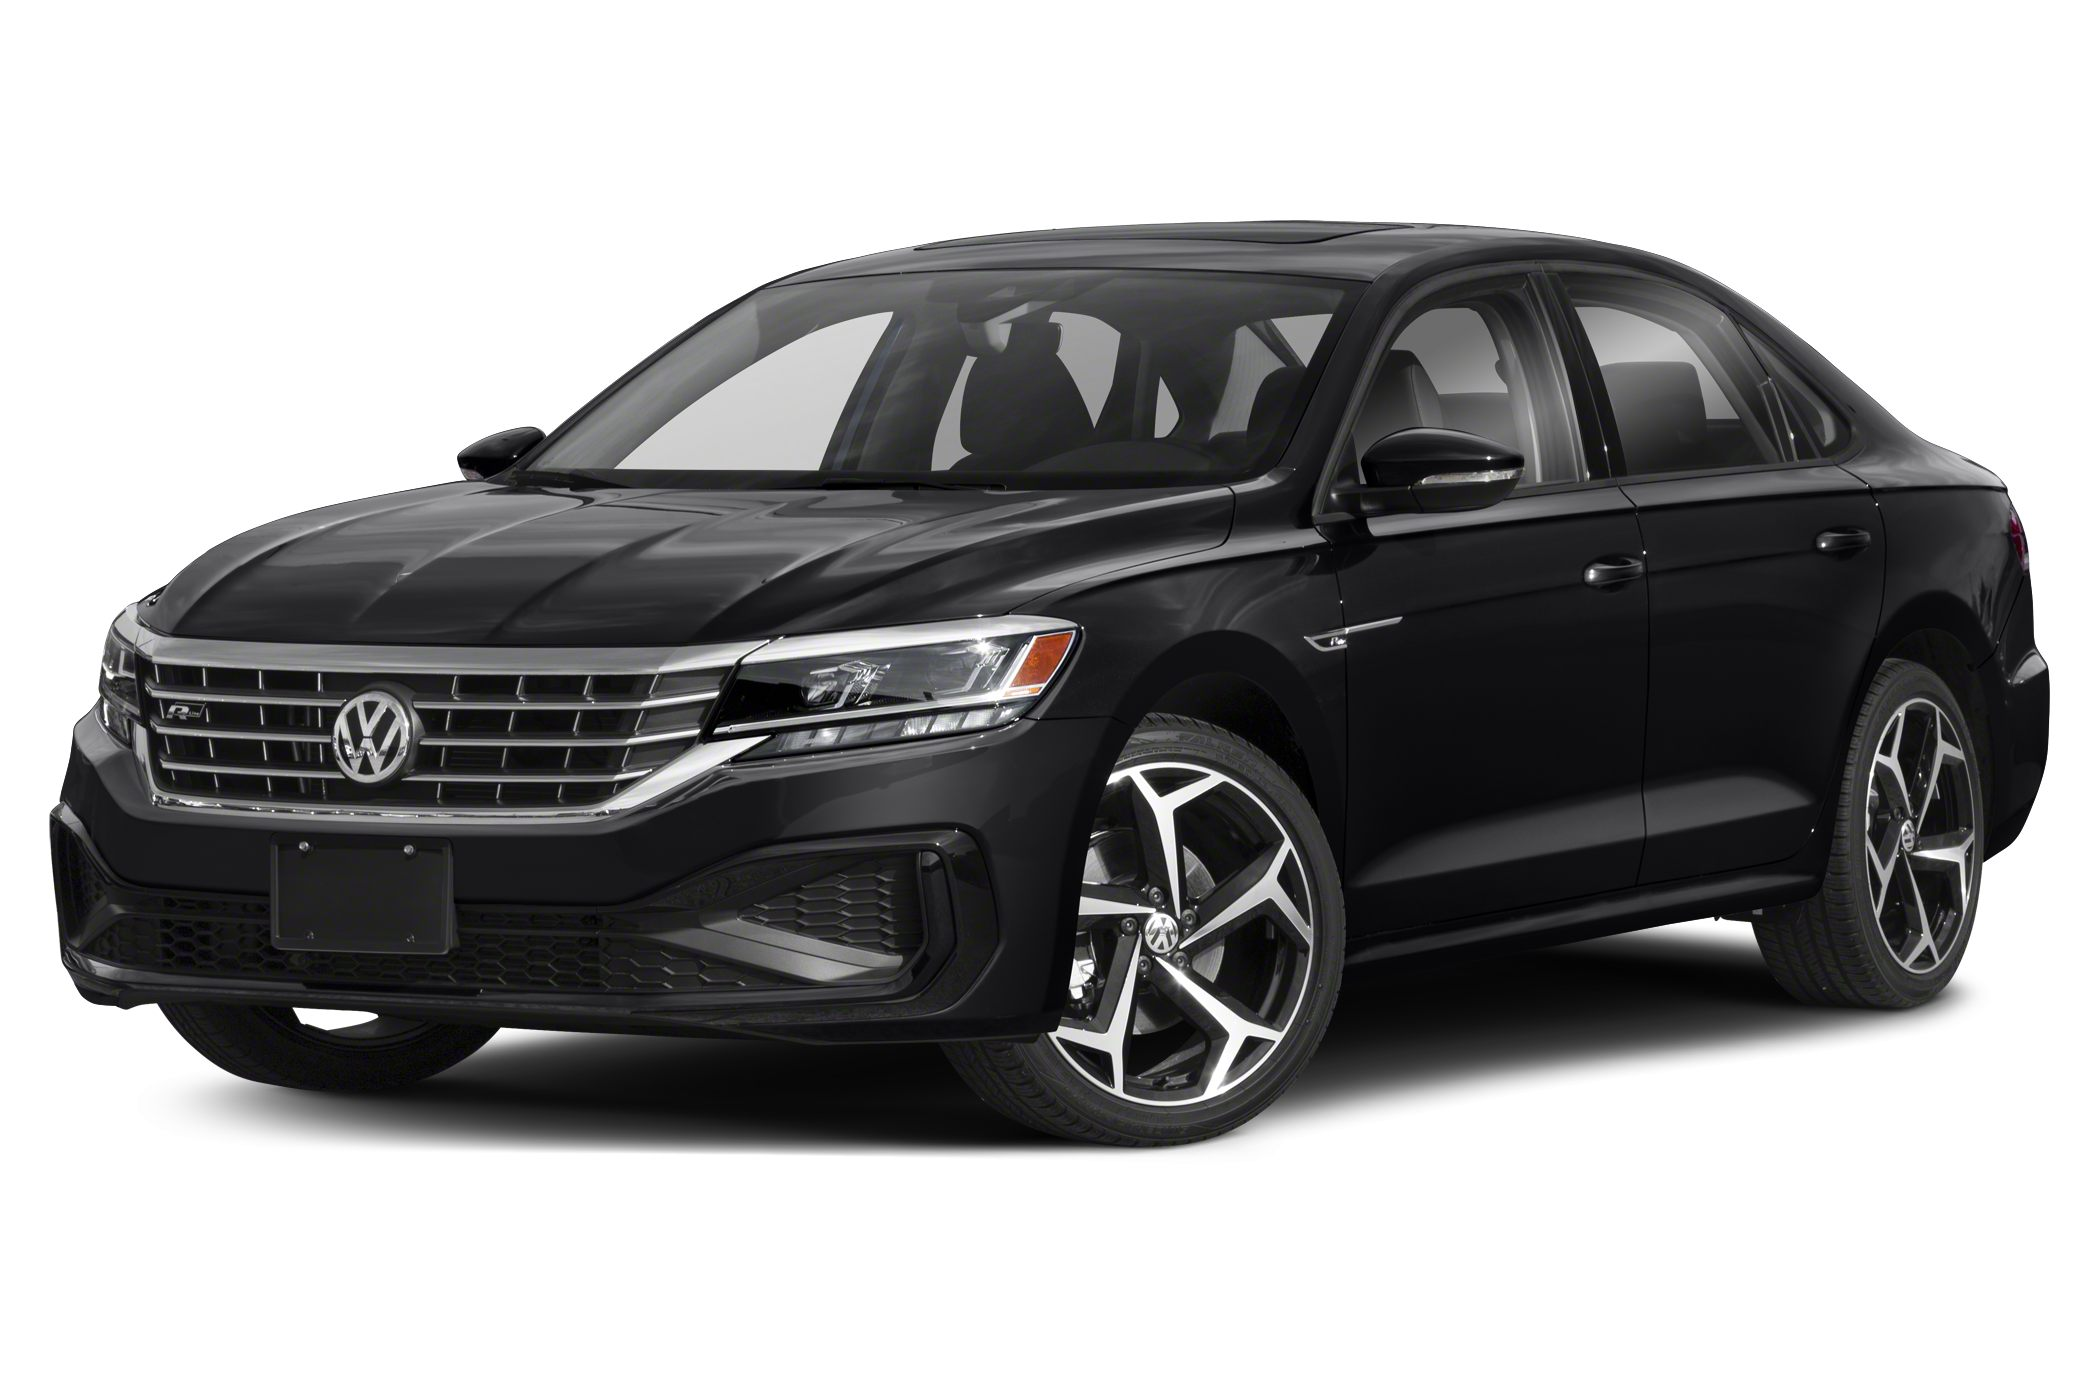 2020 Volkswagen Passat 2 0t R Line 4dr Sedan Pricing And Options